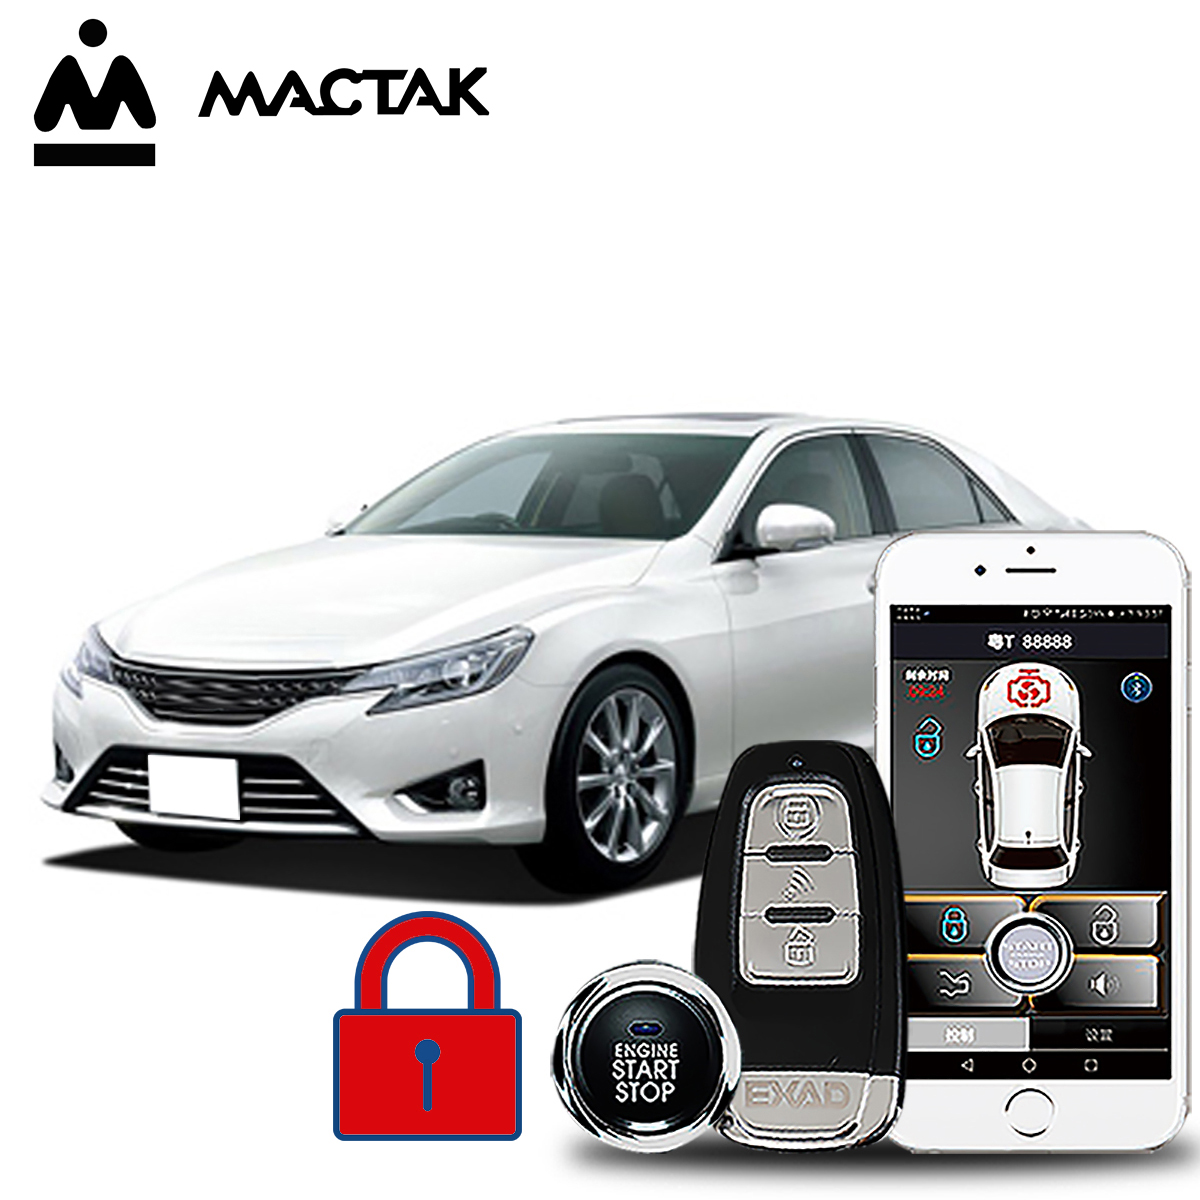 MACTAK REIZ 2014  car accessories Keyless Entry Comfort System PKE Phone APP Remote Start Car Engine Alarm Push 963